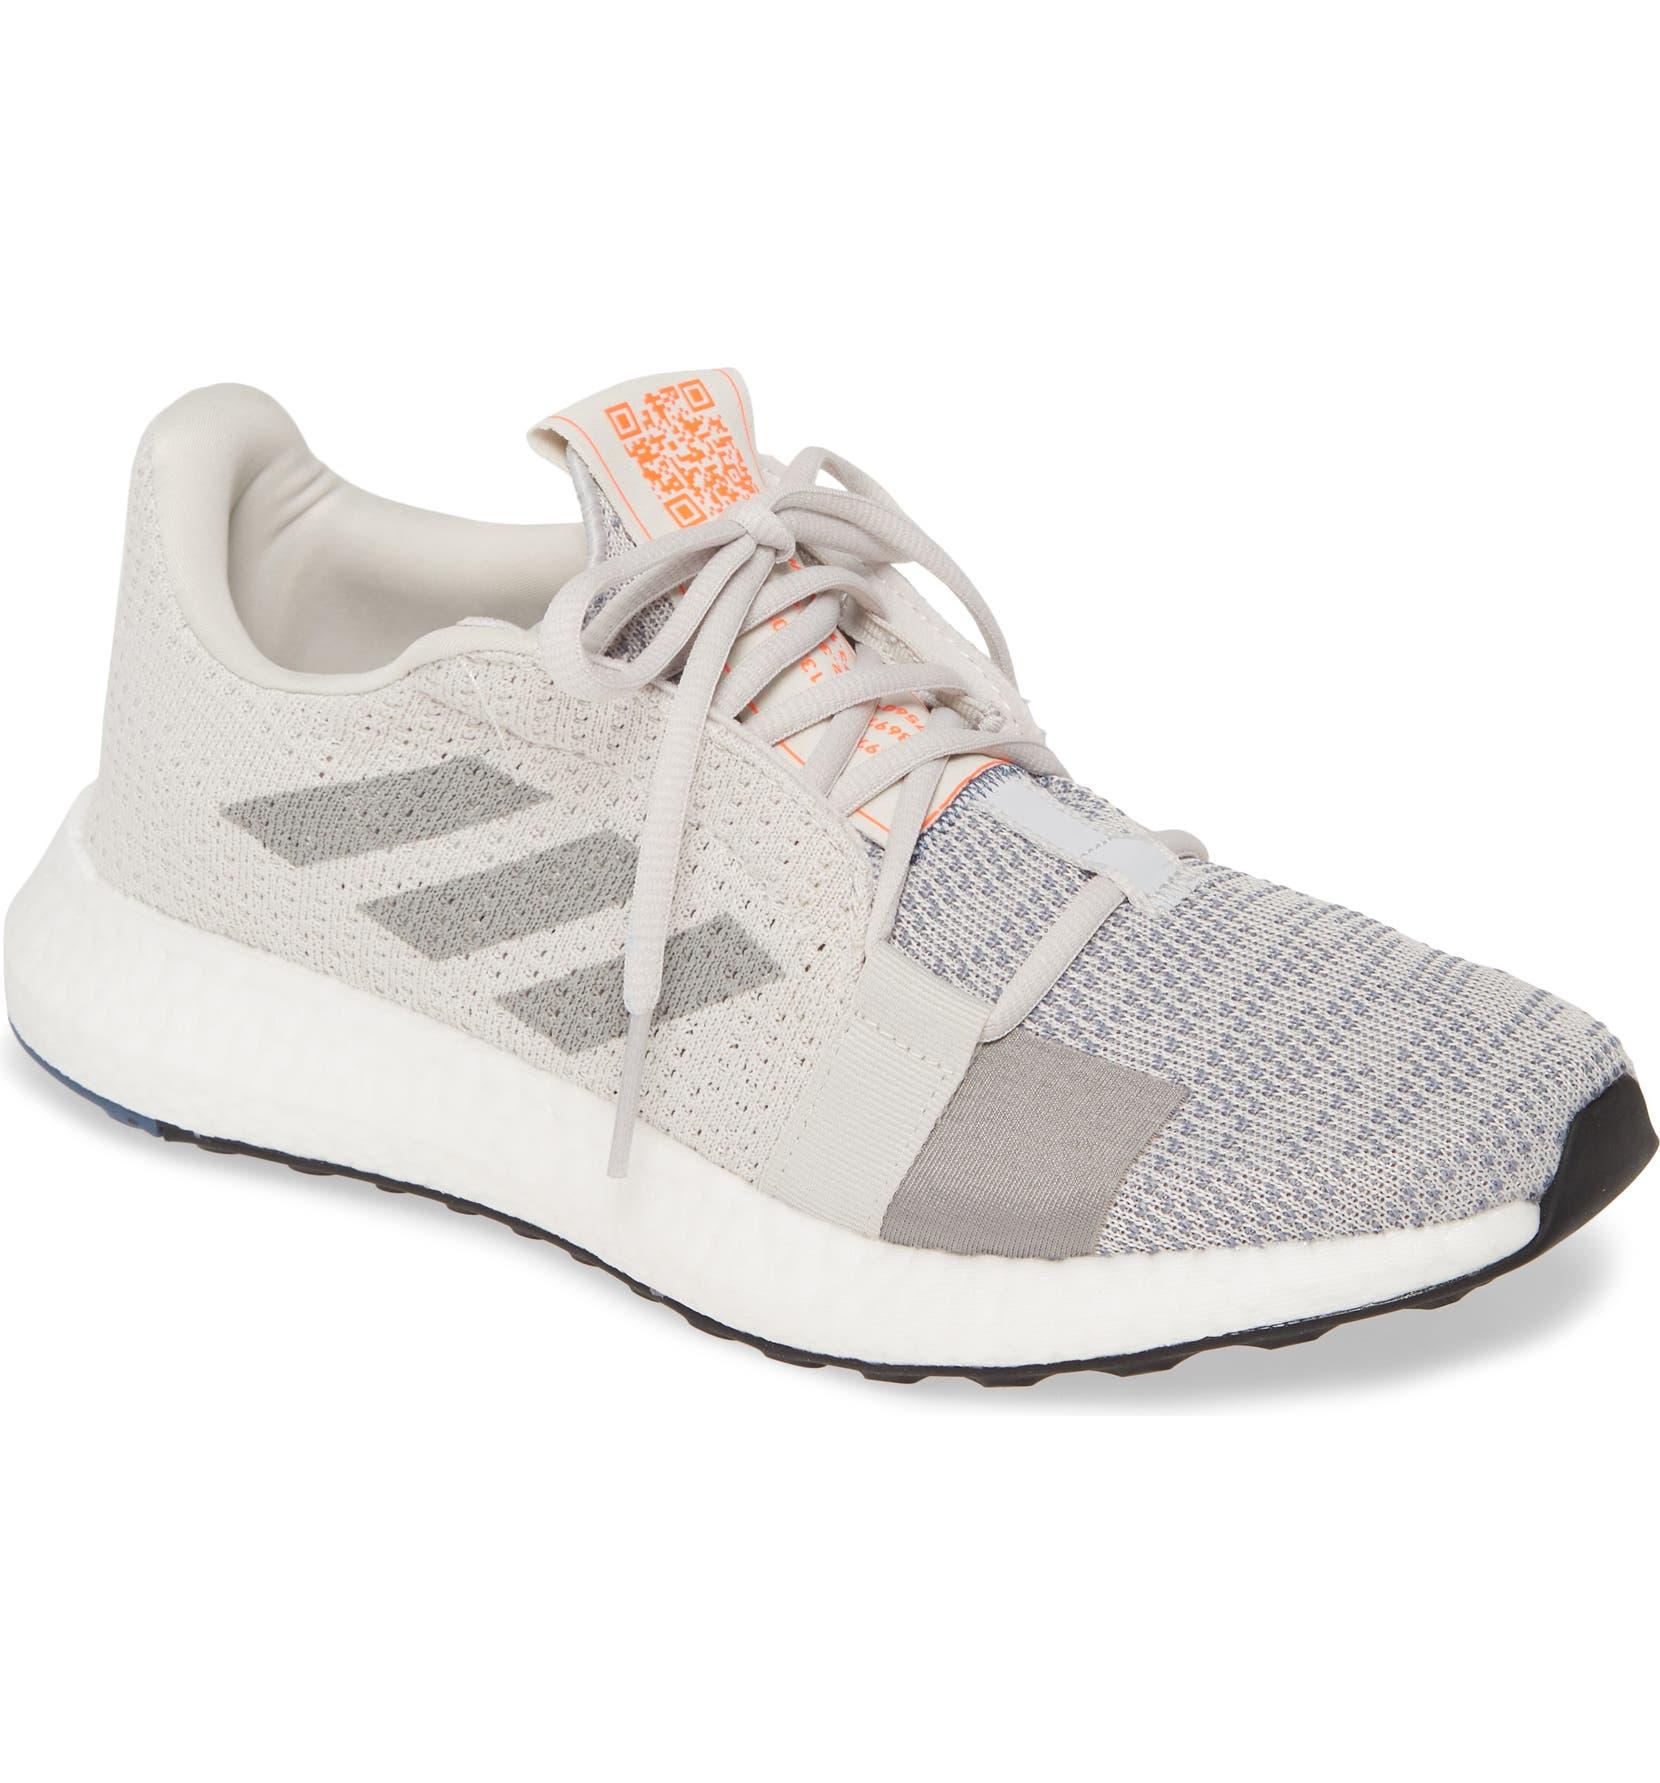 adidas Senseboost Go Shoes White adidas US  Nordstrom